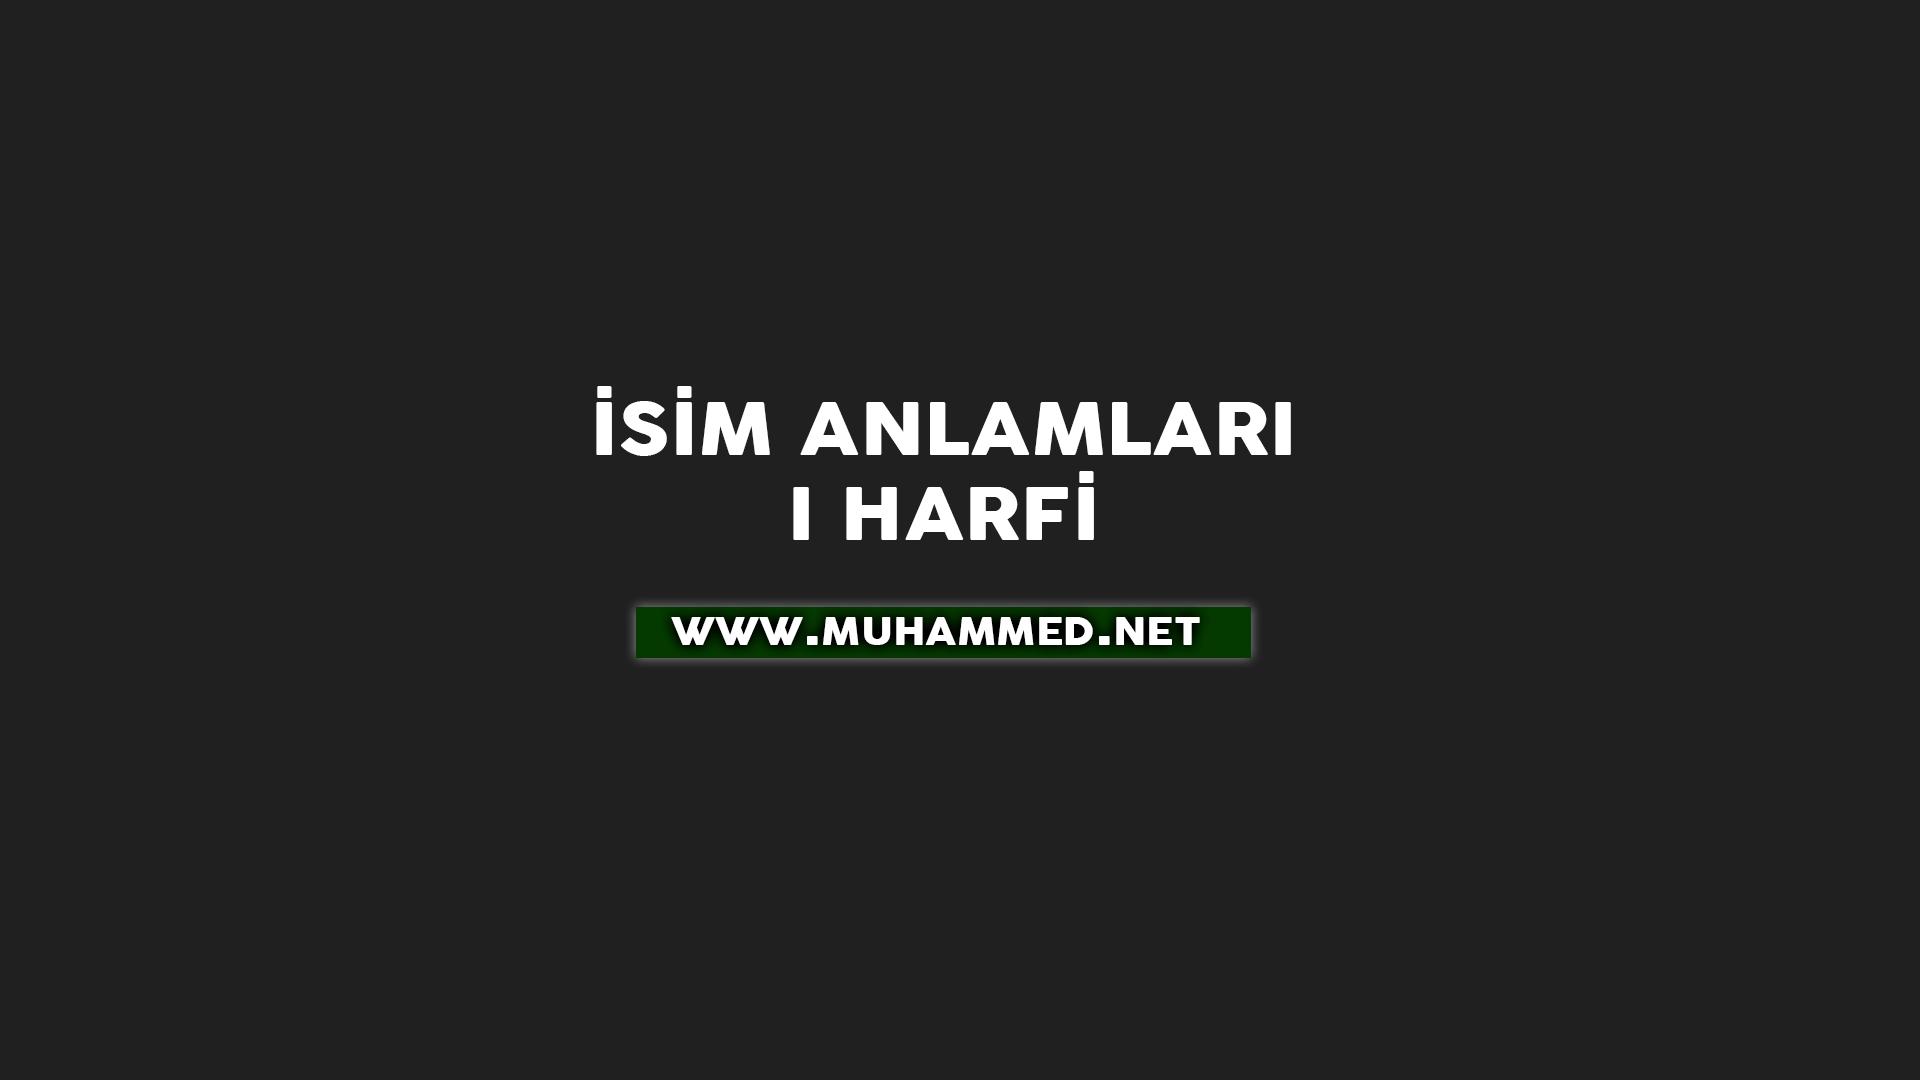 İsim Anlamları - I Harfi